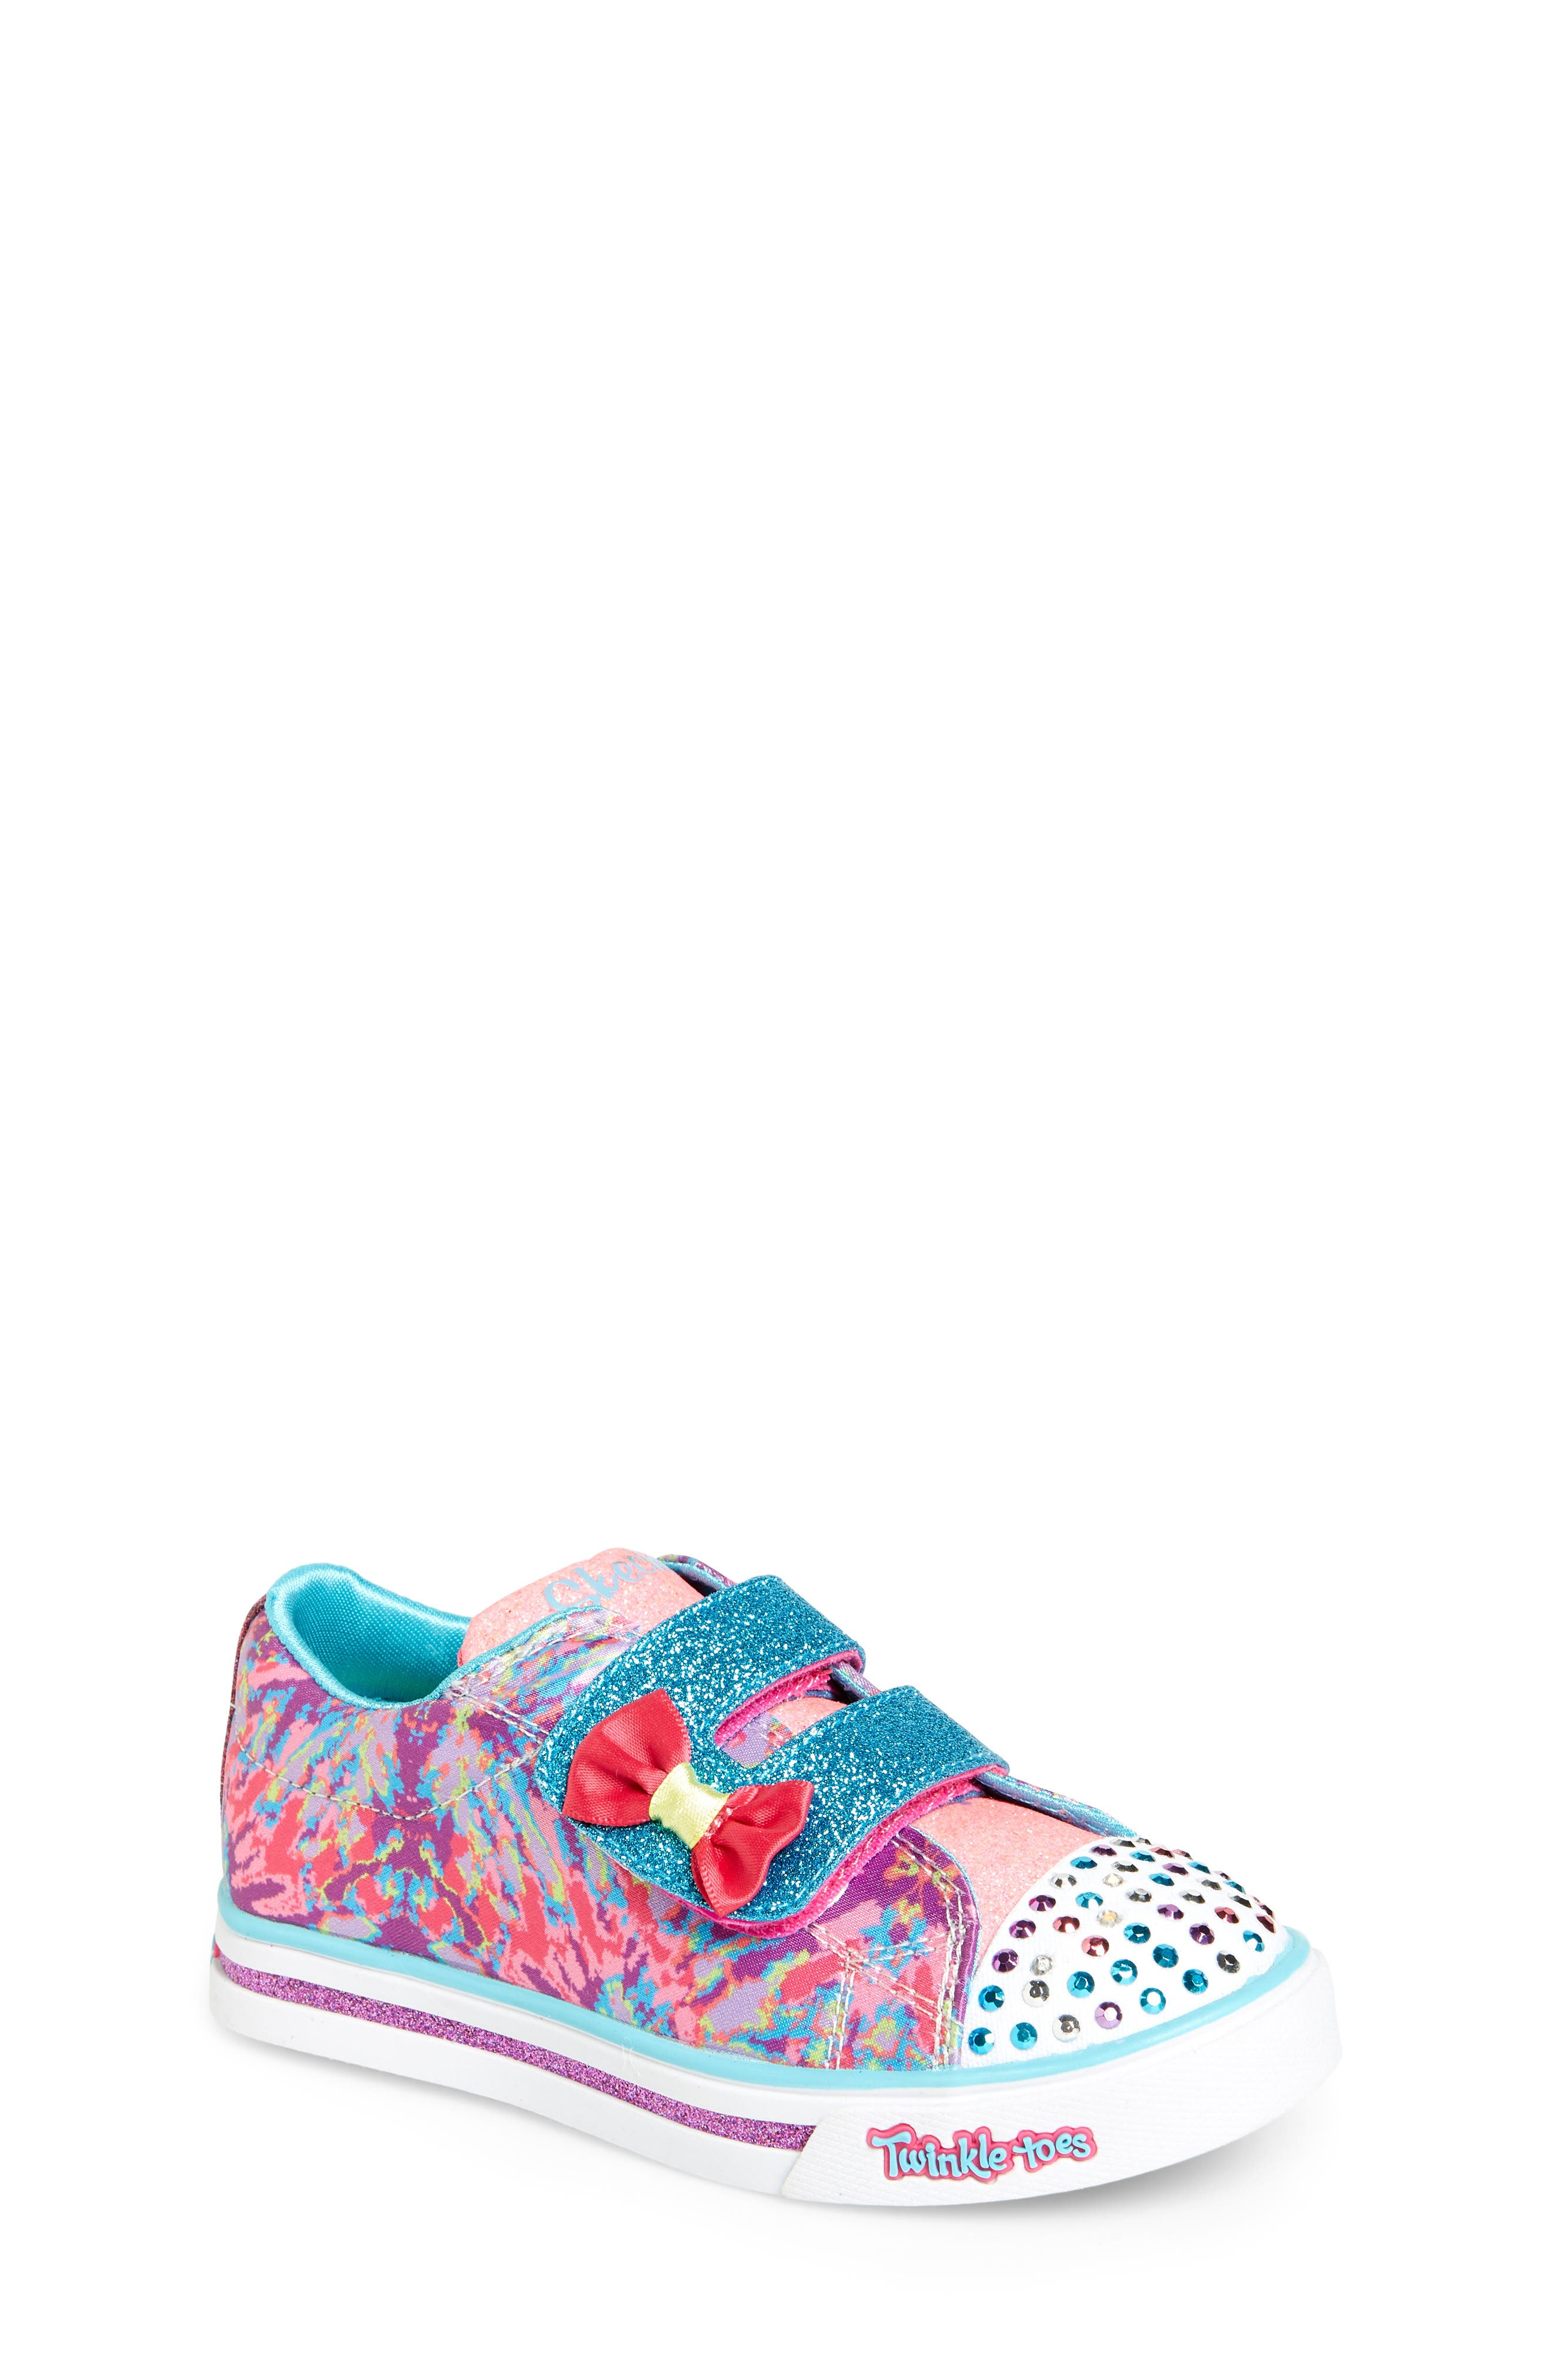 SKECHERS Sparkle Glitz Lil Dazzle Sneaker (Toddler & Walker)